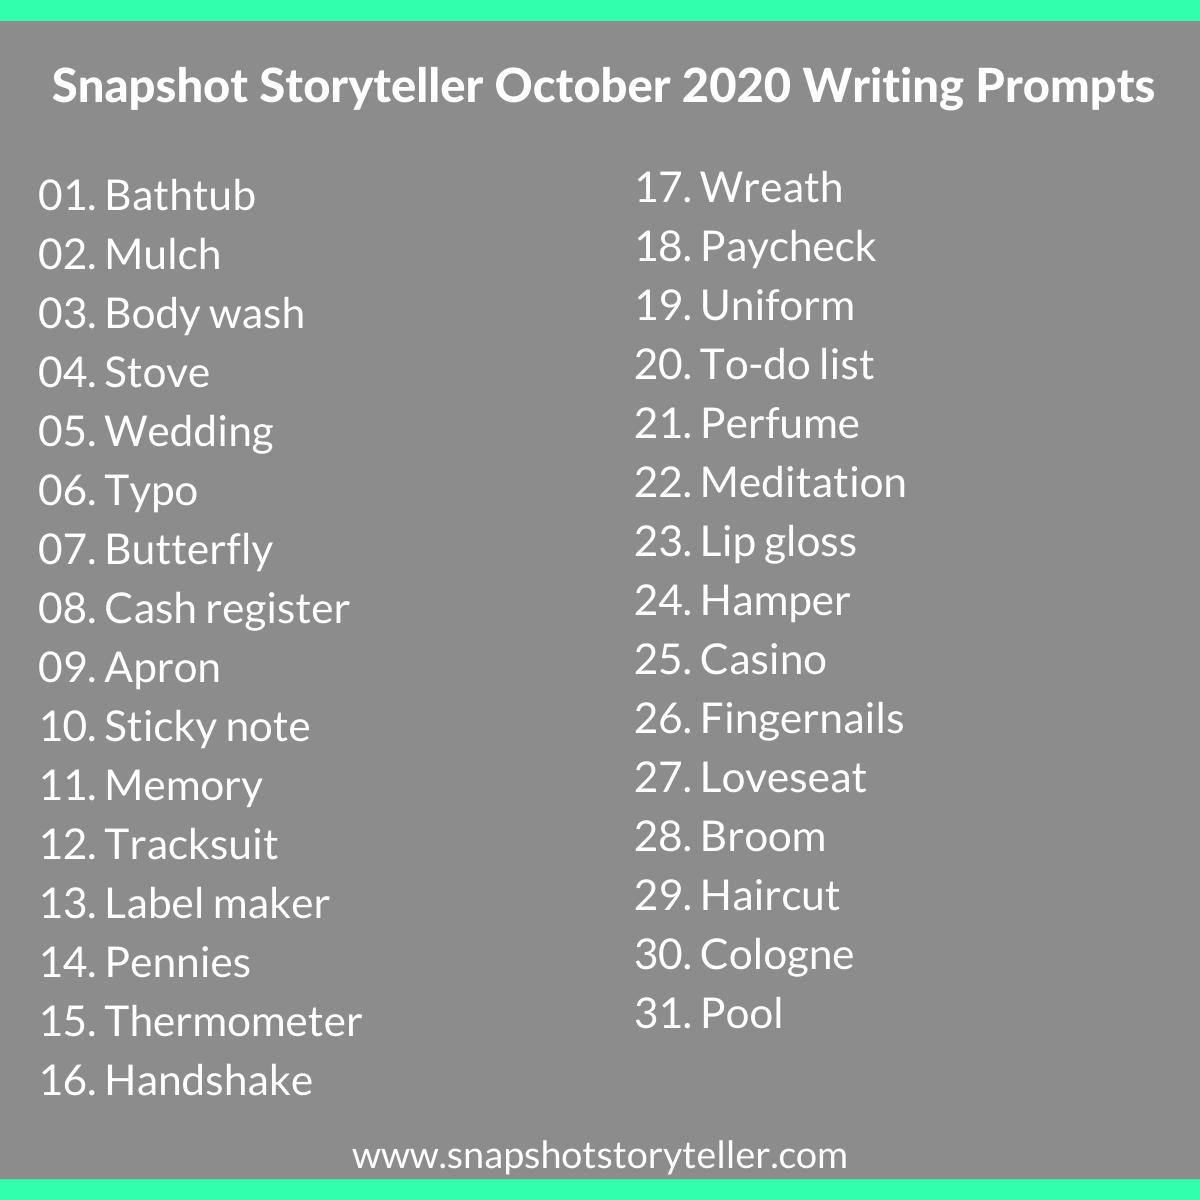 Snapshot Storyteller | October 2020 Writing Prompts | www.snapshotstoryteller.com | #amwriting #SnapshotStoryteller #creativestoryteller #creative #storyteller #creativewriter #IWrite #WriteOn #writersofinstagram#writingprompt #writingprompts